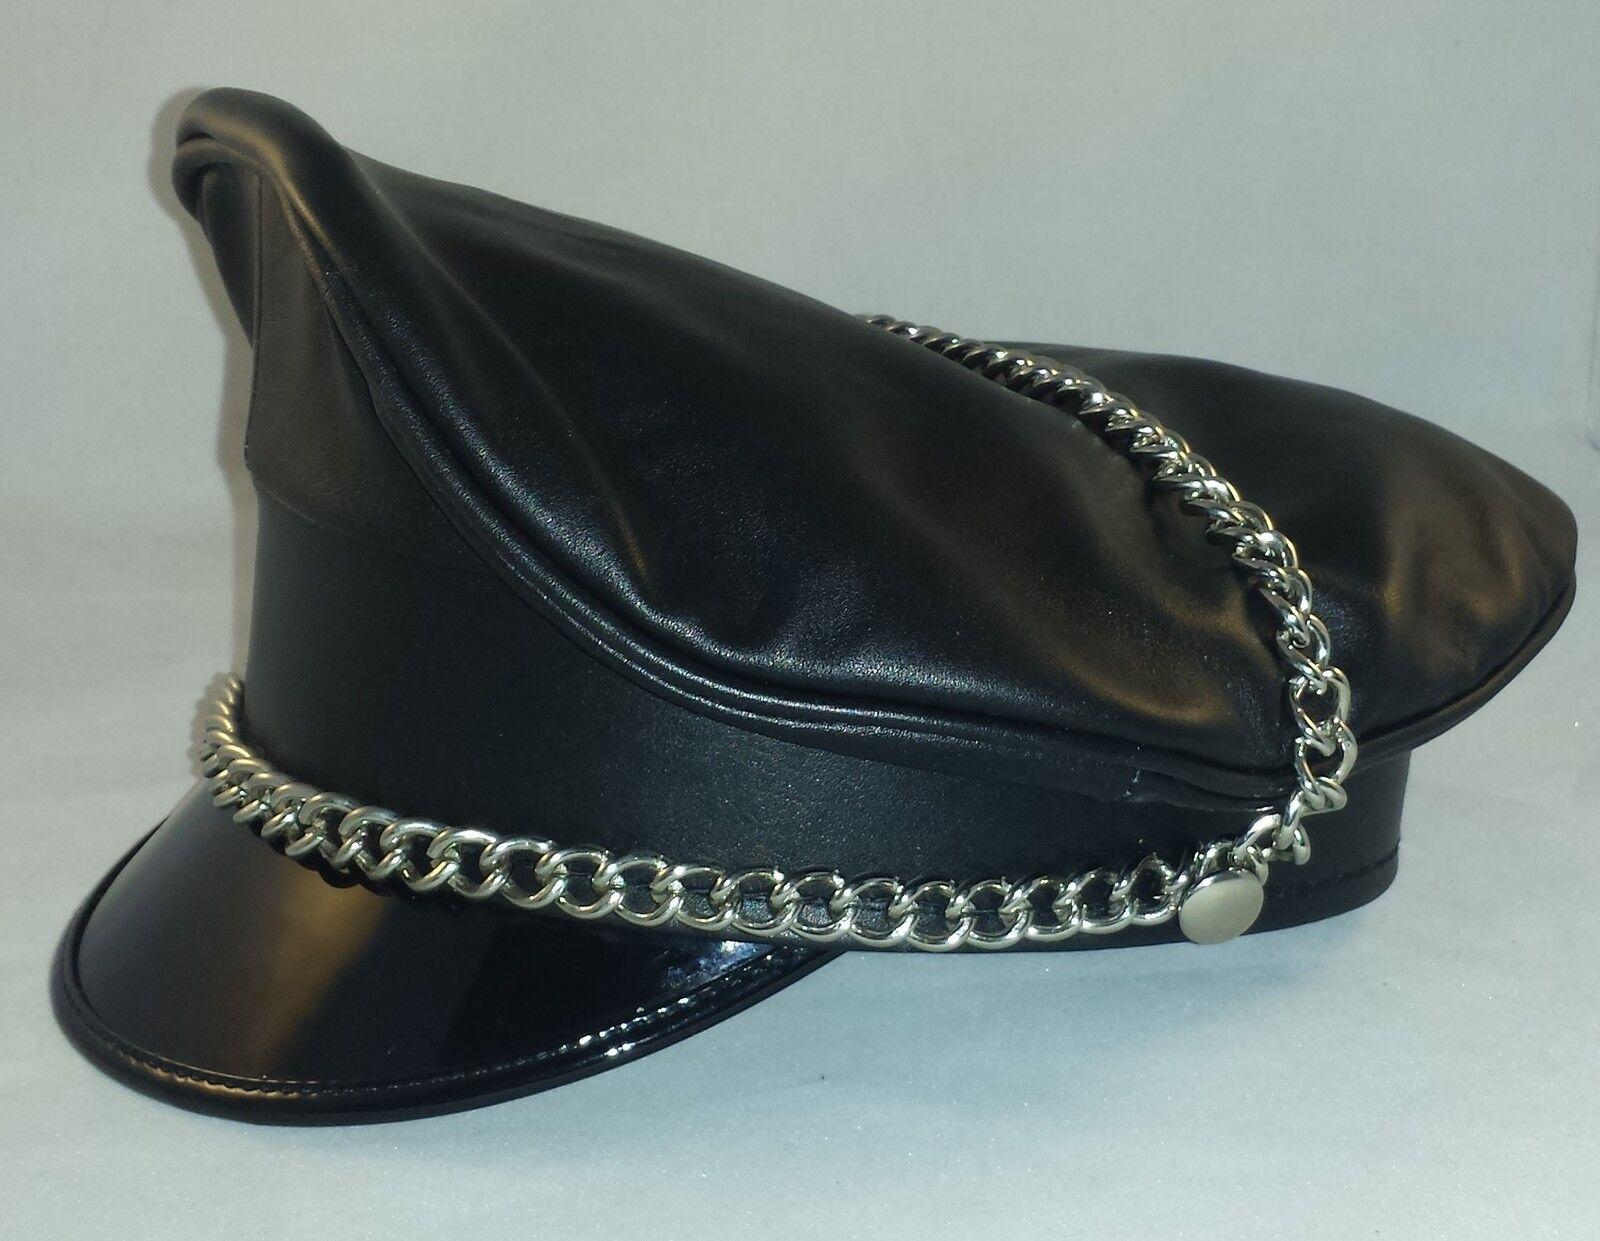 0058 Echt Leder schrimmütze + HEEL + Chain Officer Hat Leather Kape, Leather Hat